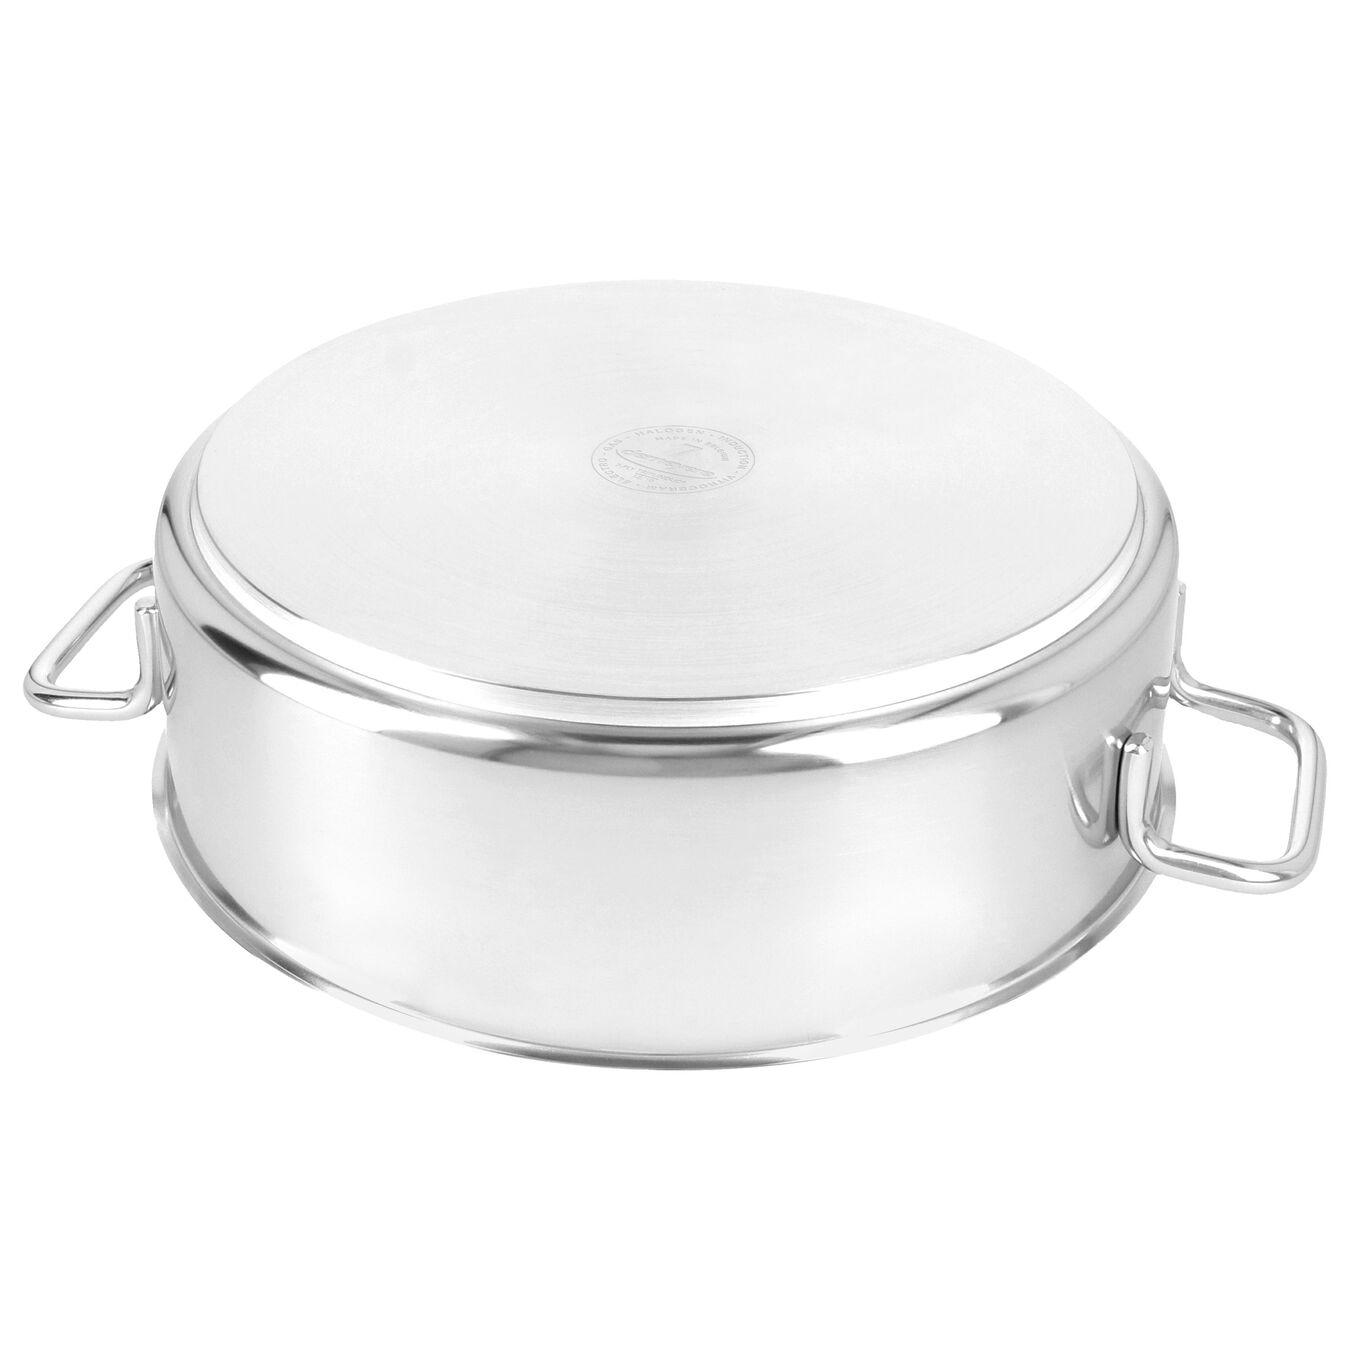 Kookpot met glazen deksel 24 cm / 2,8 l,,large 6